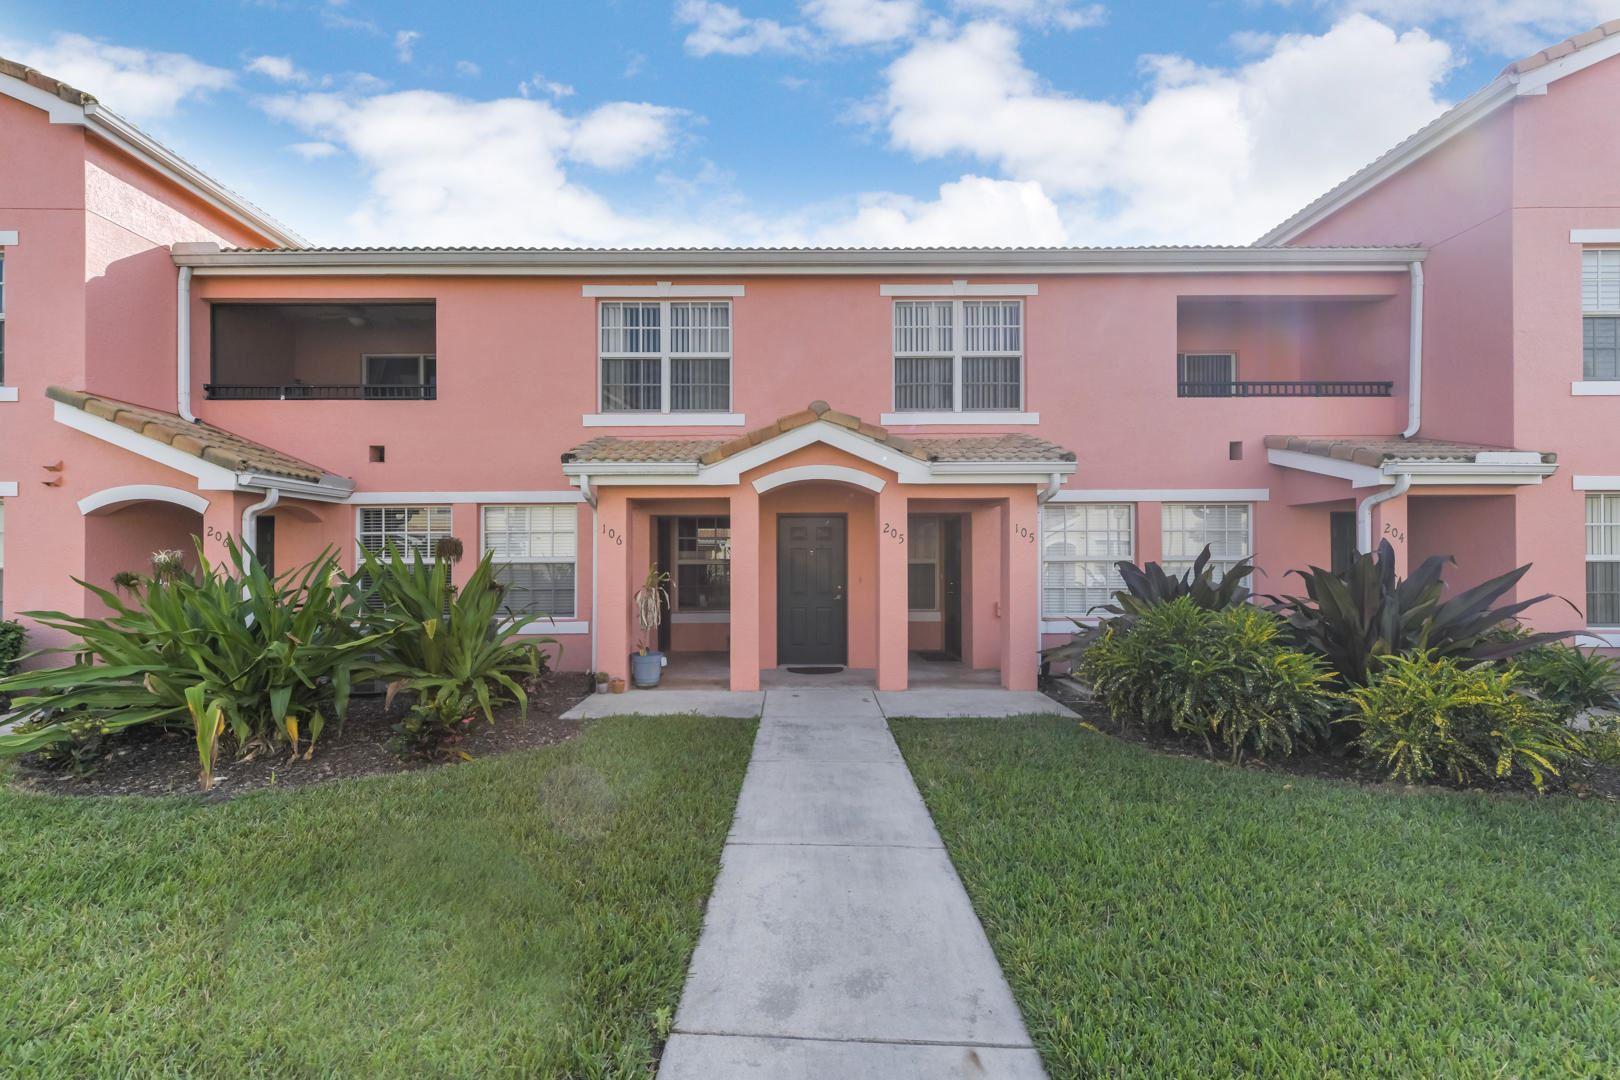 132 SW Peacock Boulevard #17205, Port Saint Lucie, FL 34986 - #: RX-10610823